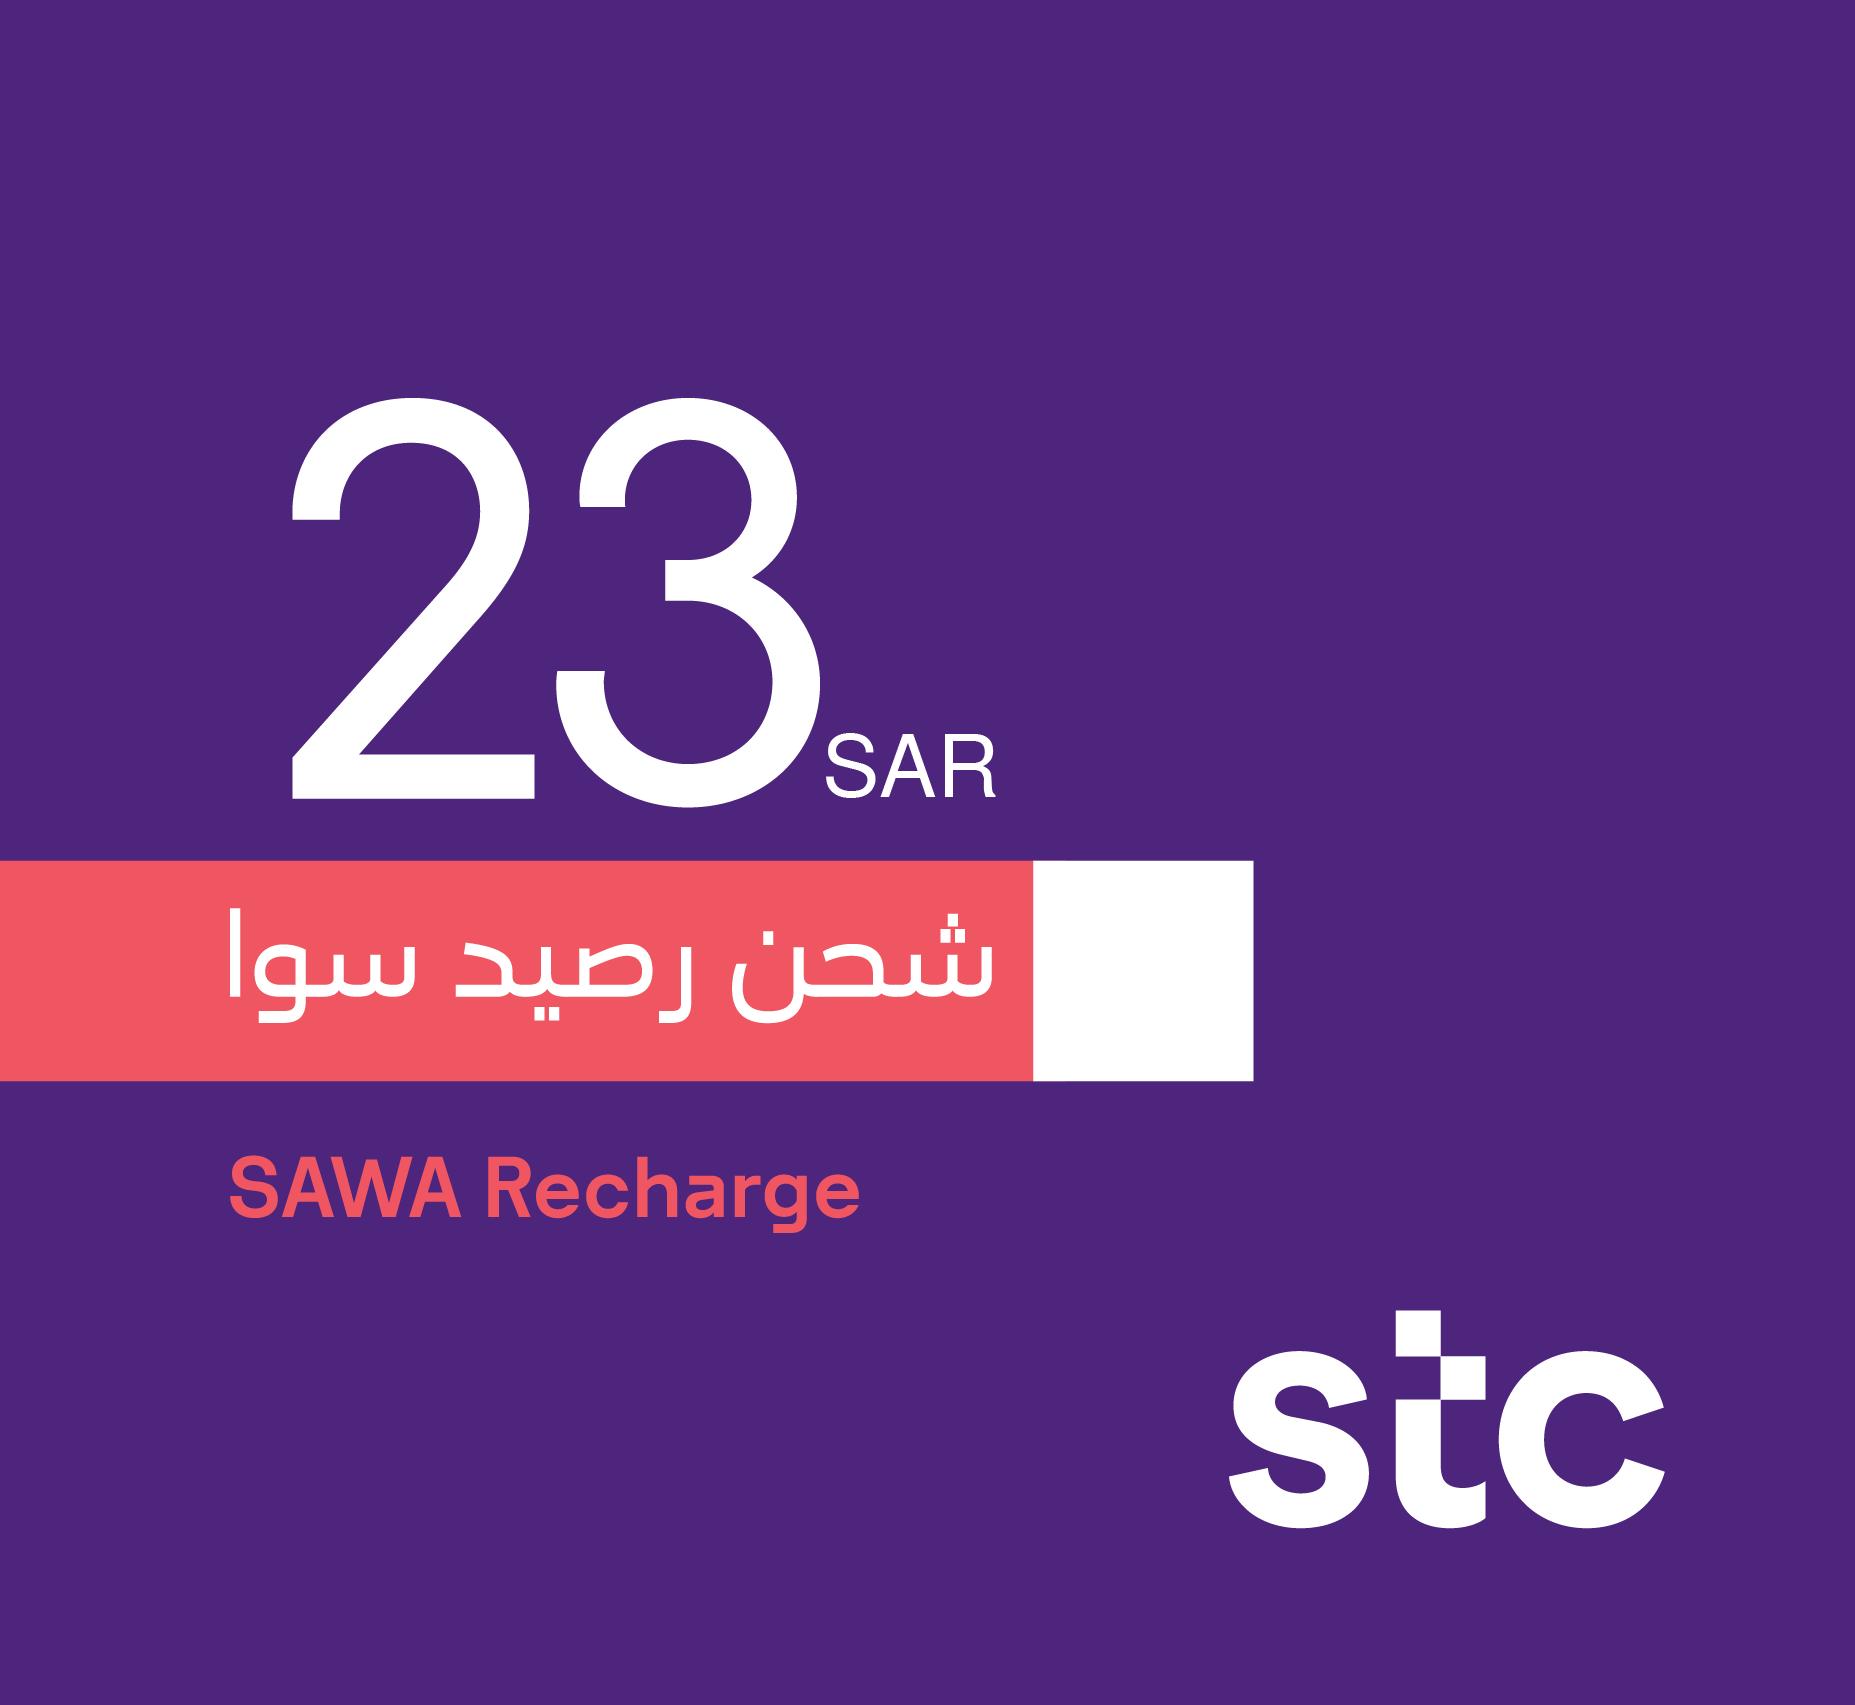 Sawa Recharge Card SR 23